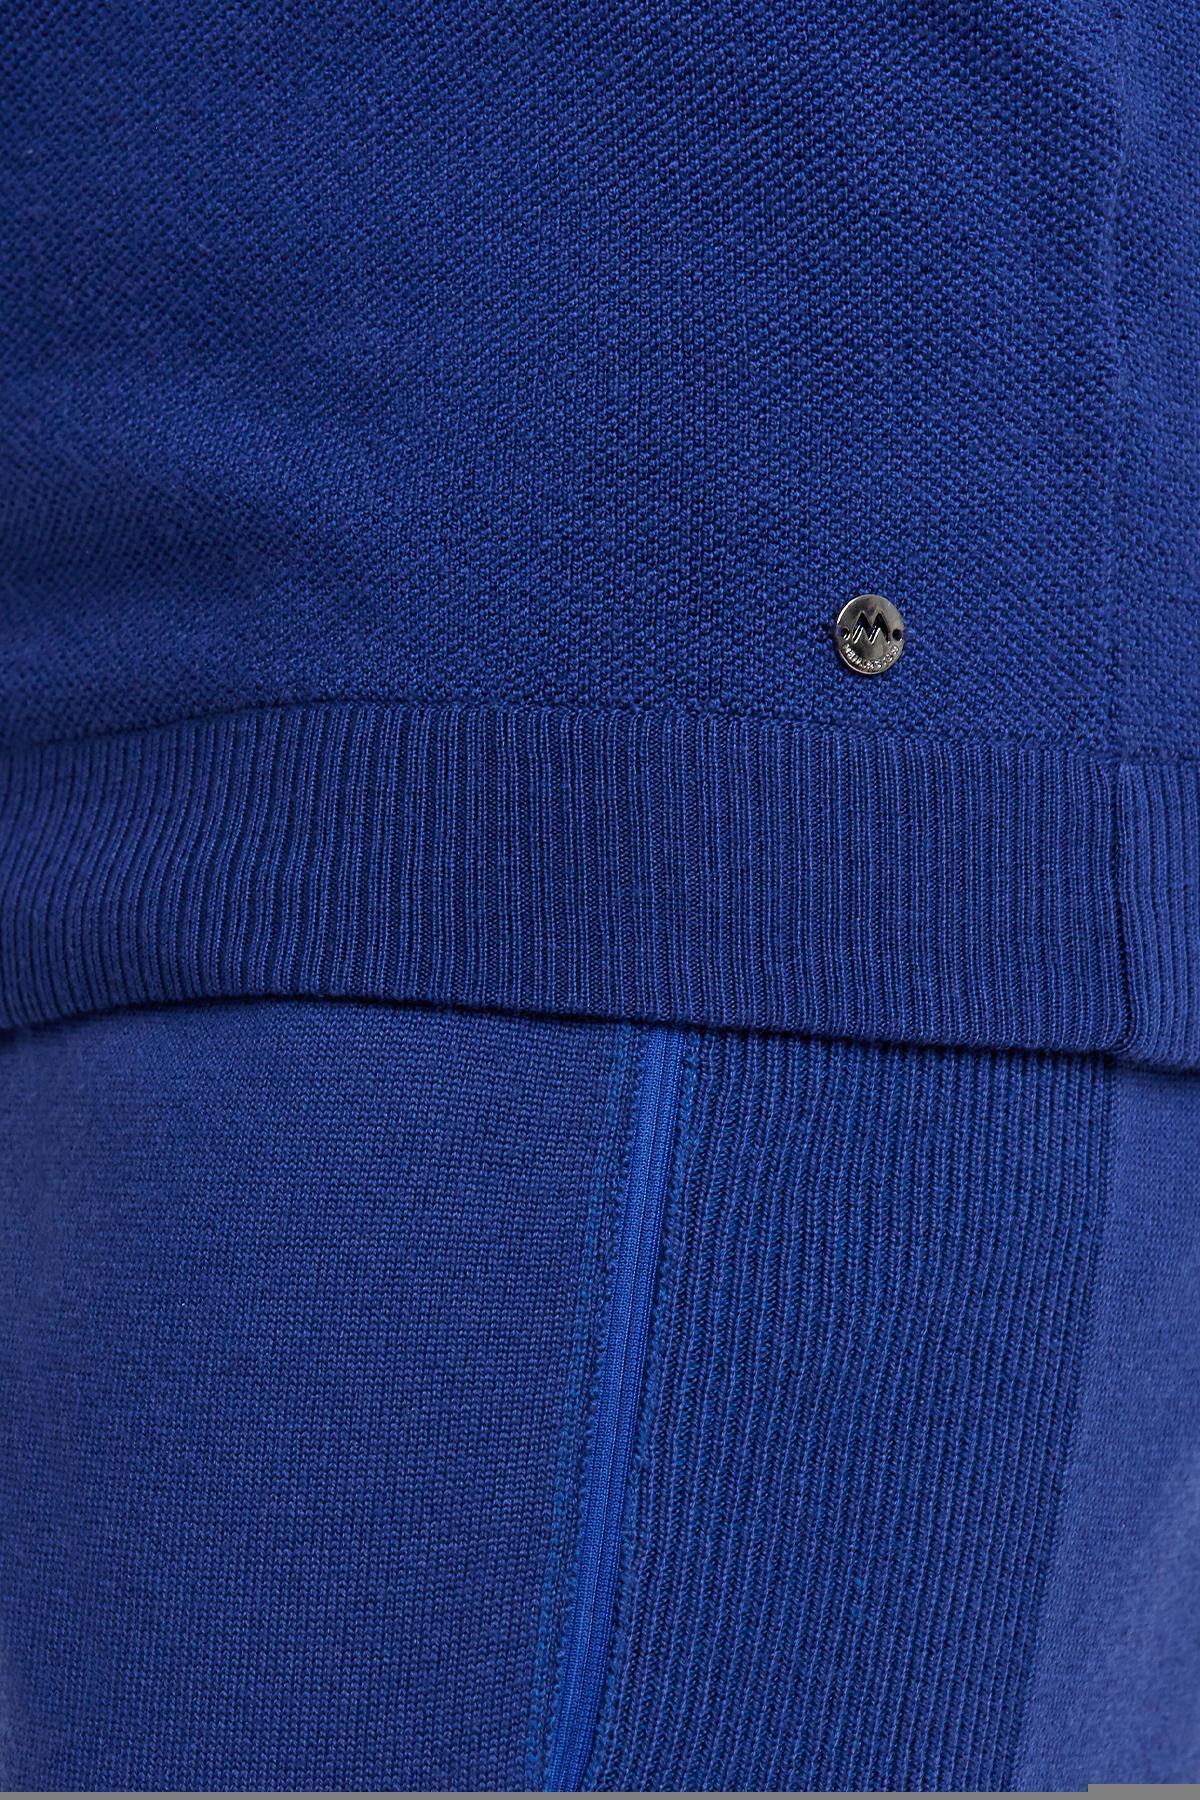 Bisiklet Yaka Merino Yün Mavi Activewear Triko